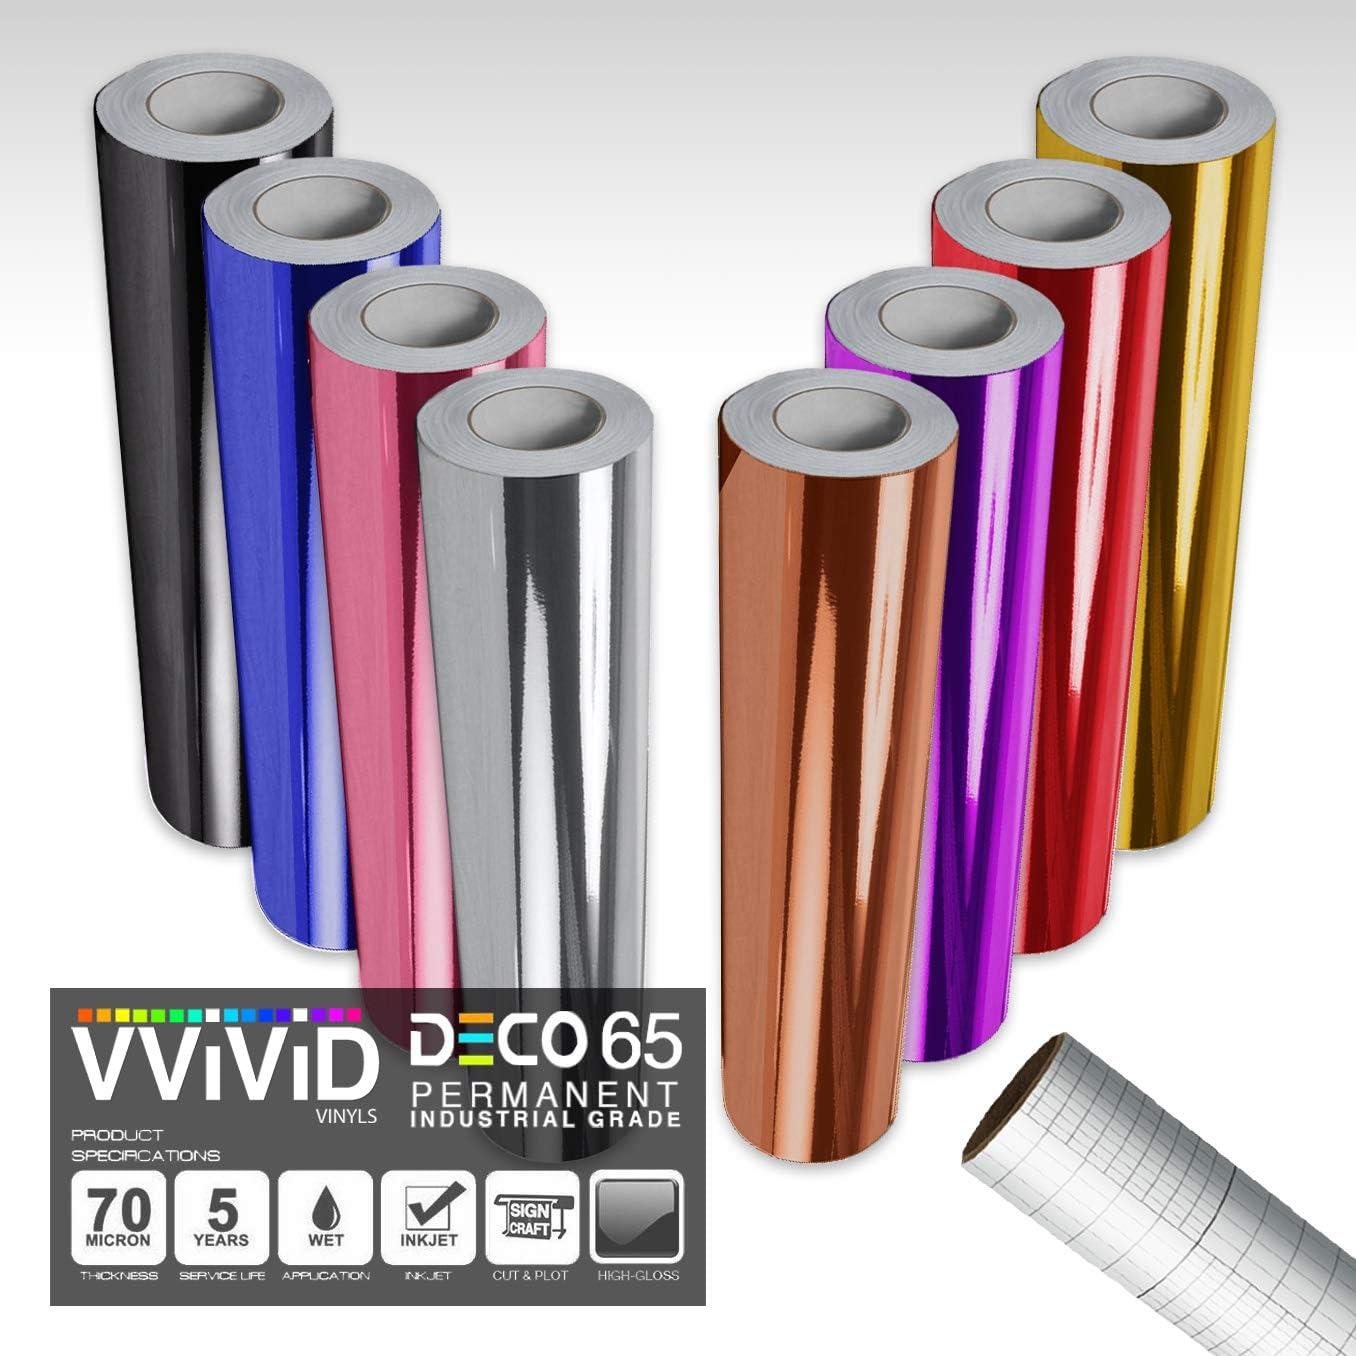 Silho VViViD Chrome Gold Gloss DECO65 Permanent Adhesive Craft Vinyl for Cricut